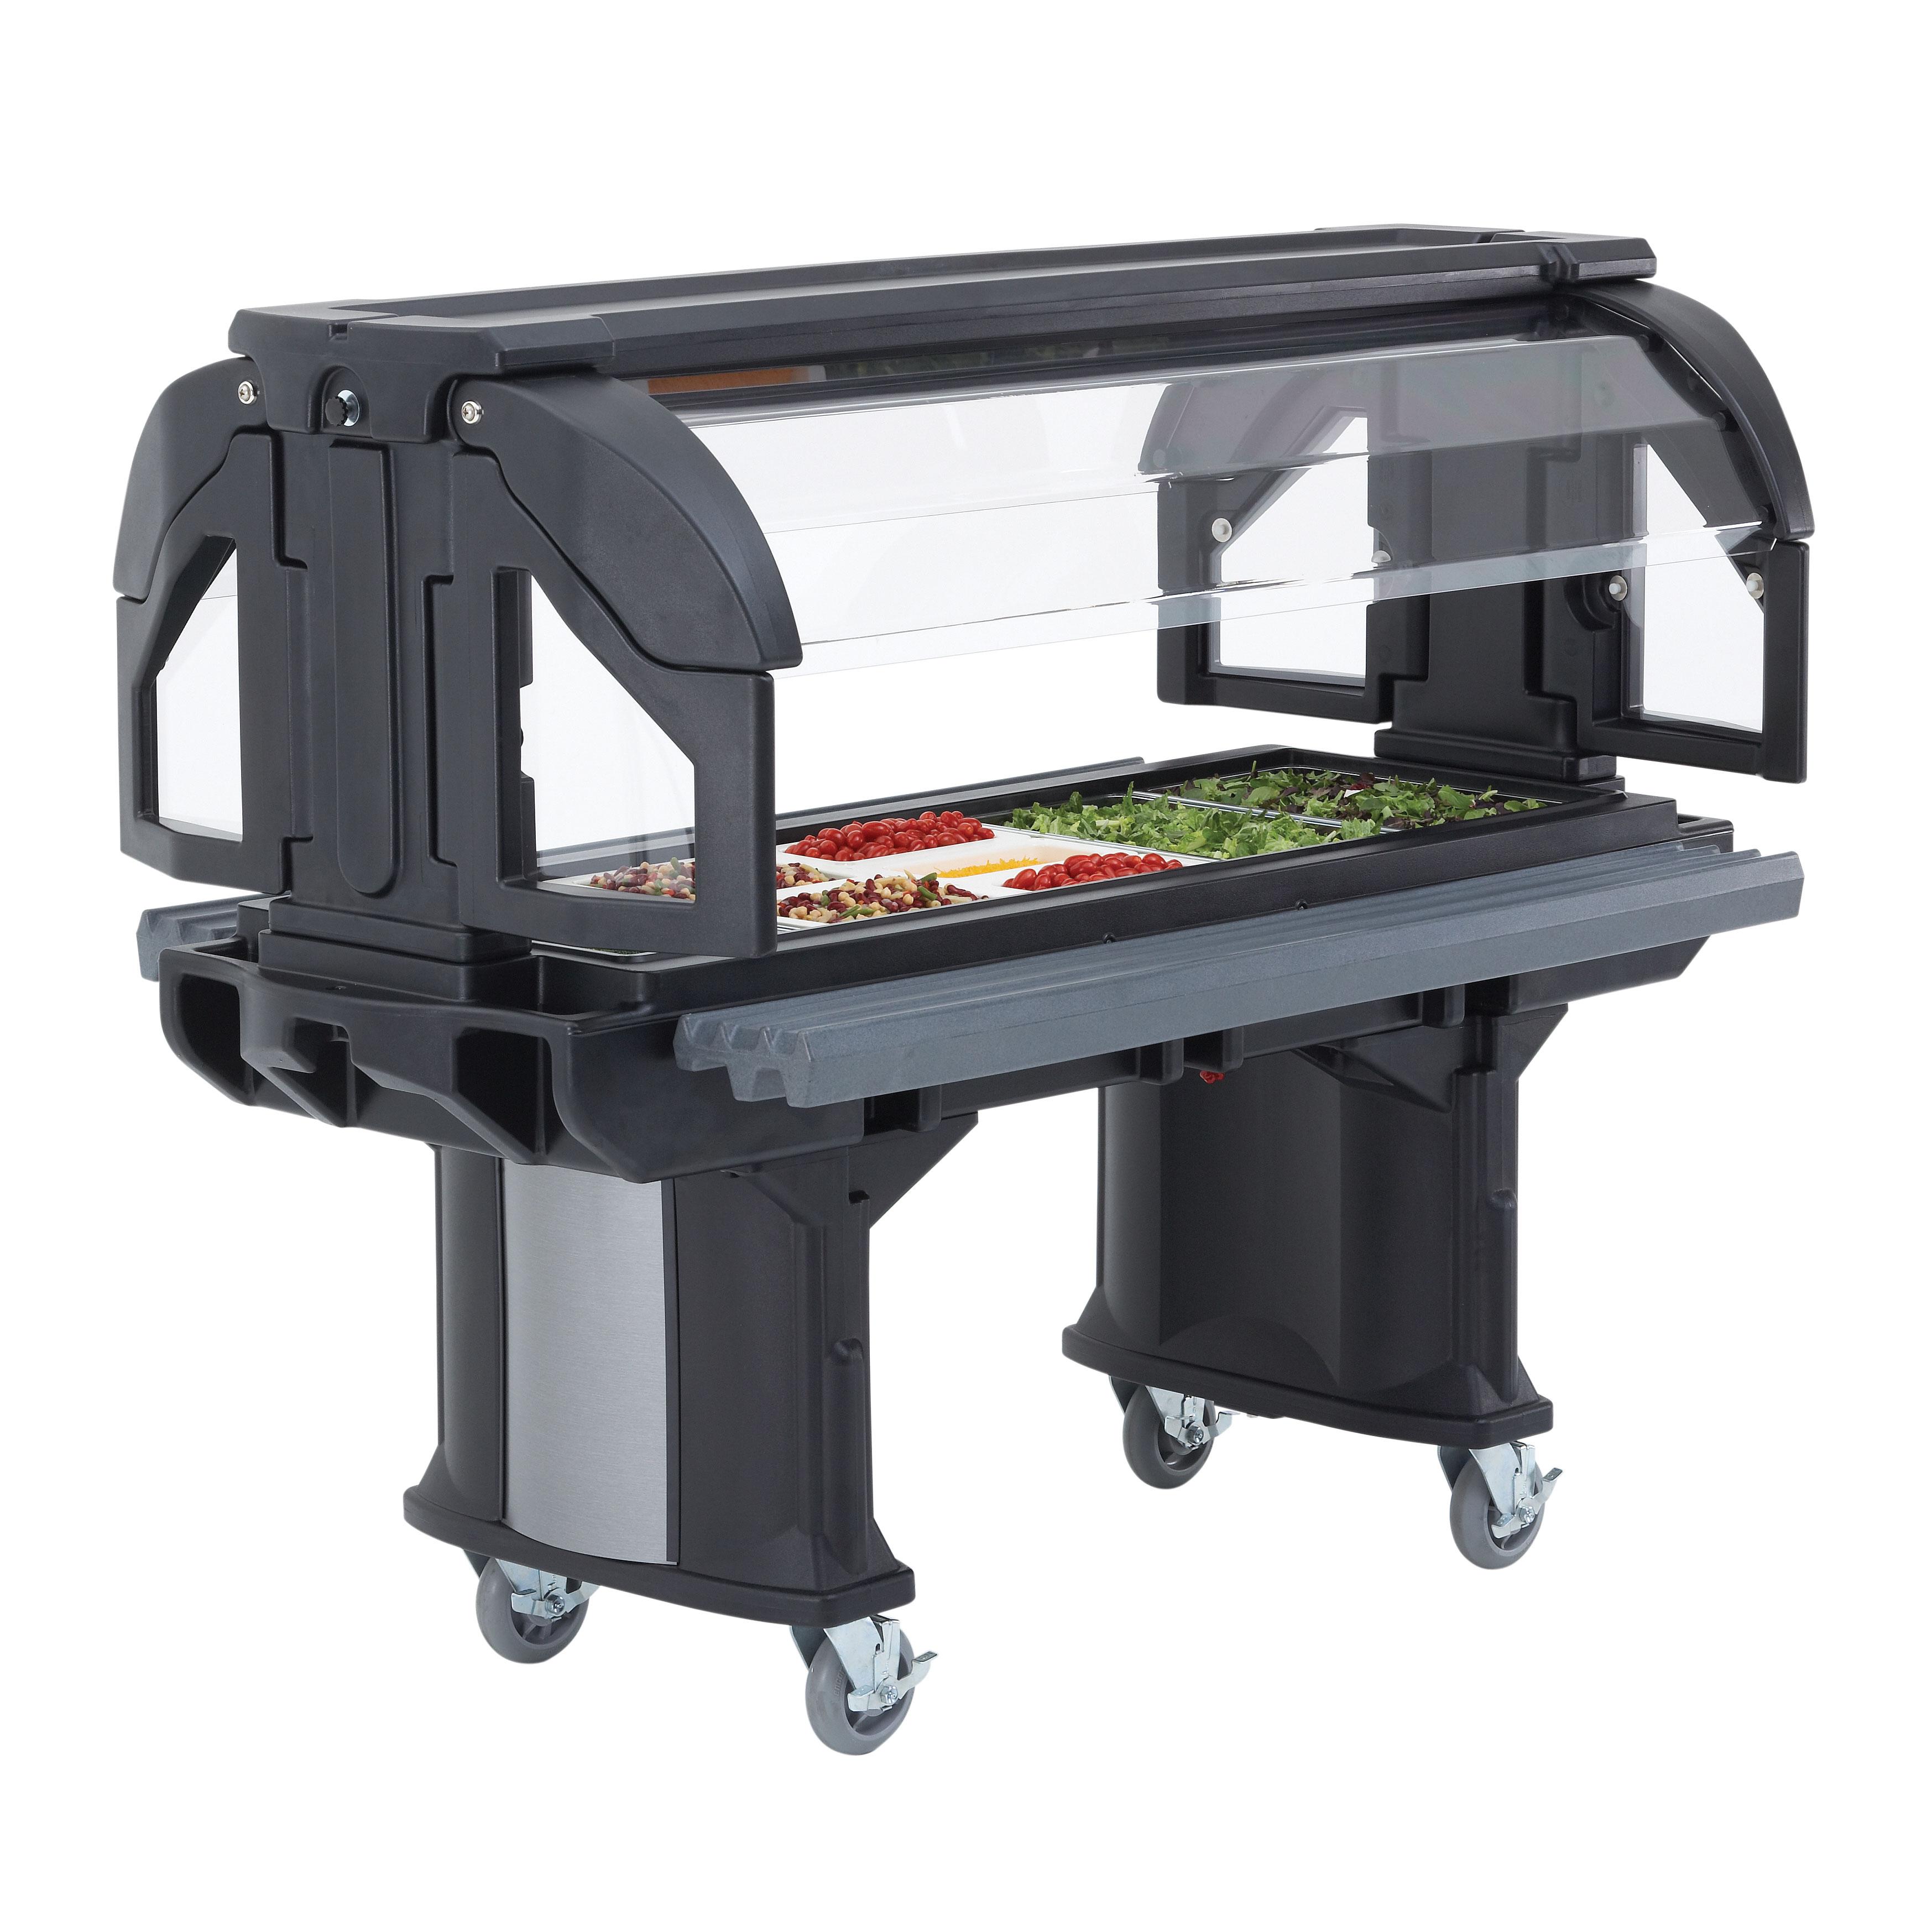 Cambro VBRL6110 portable food bars